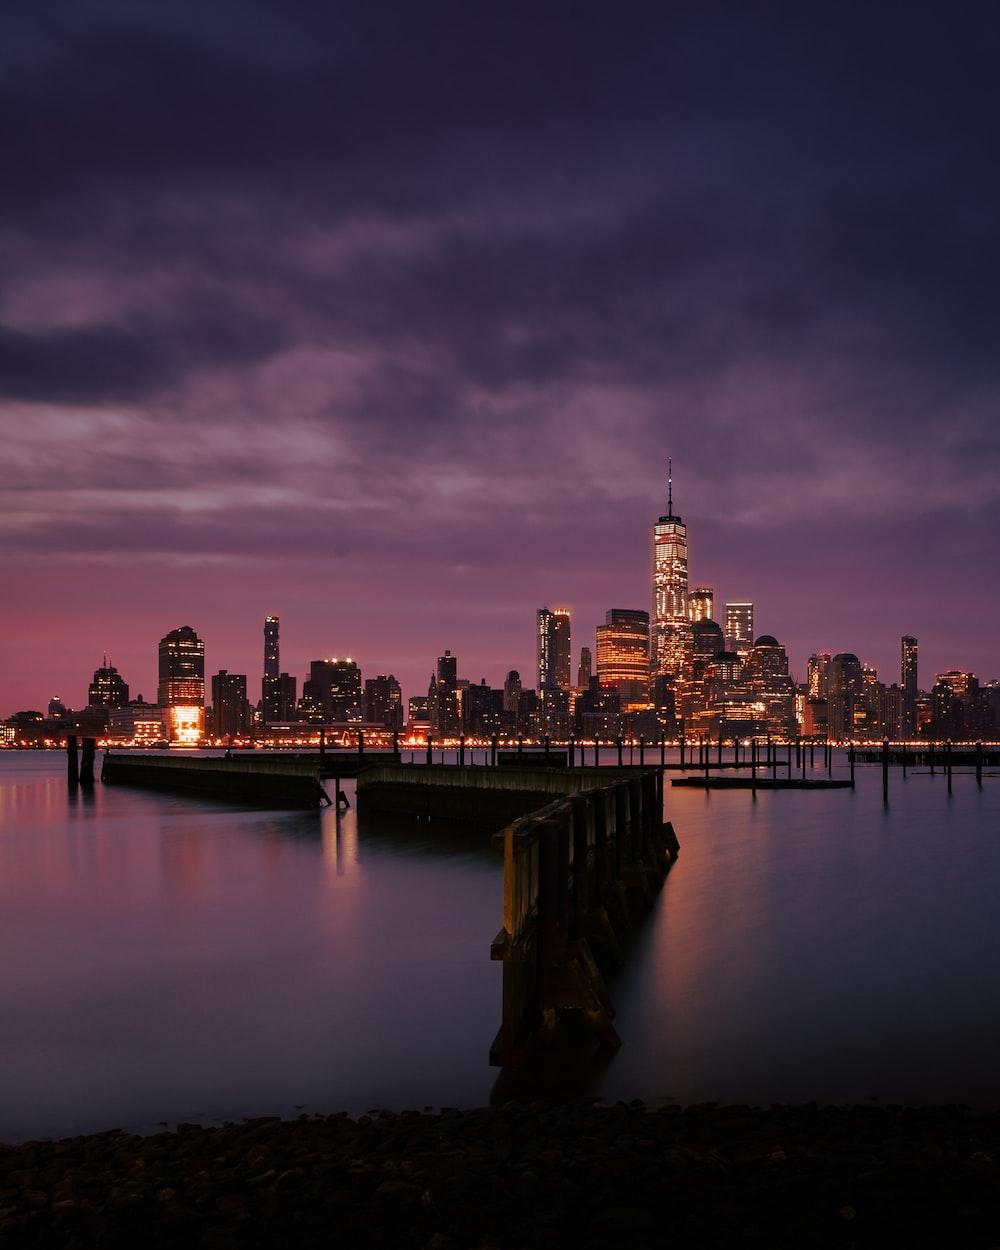 city skyline showing lights